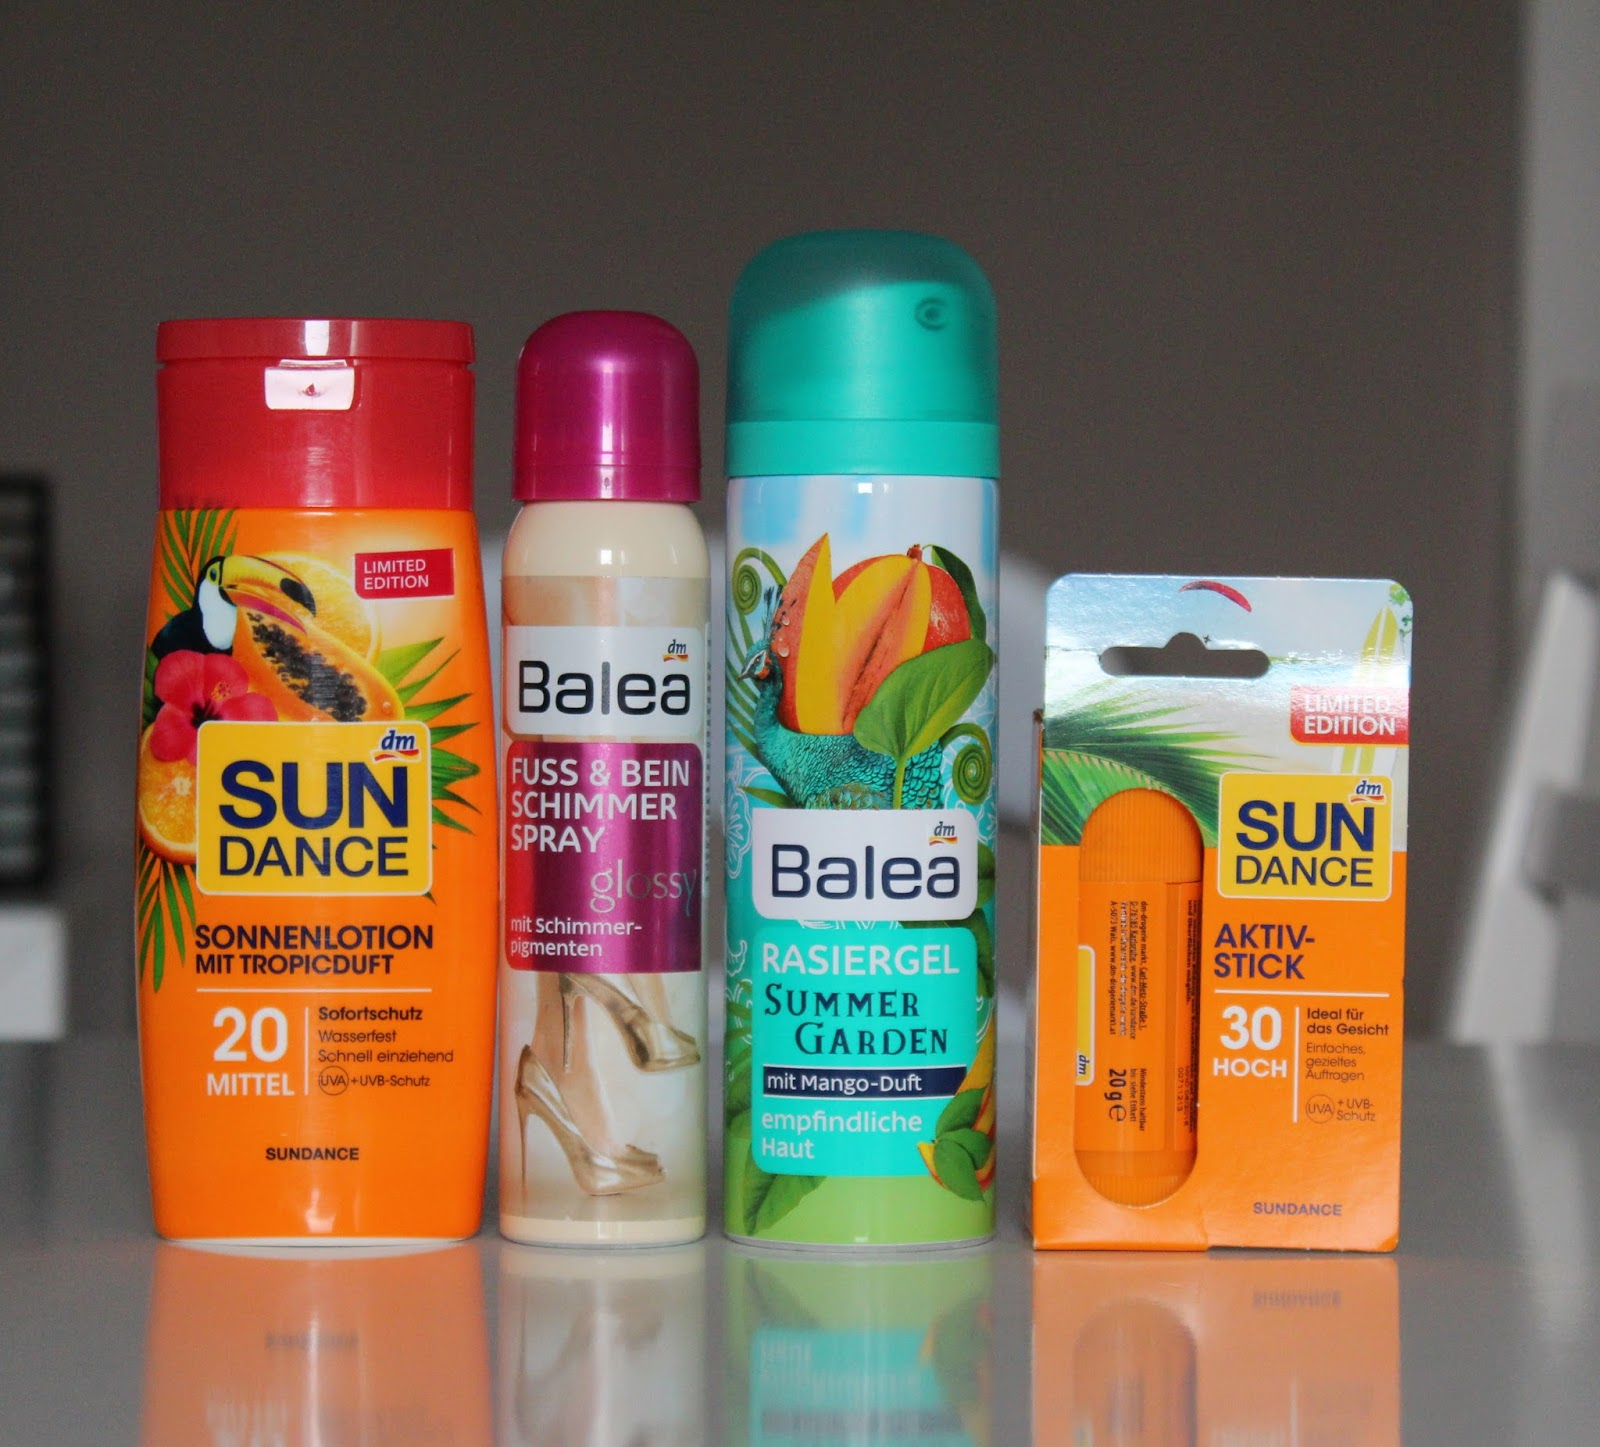 DM #7 - Balea Sun Dance losion i stik, sjajni sprej za noge i gel za brijanje